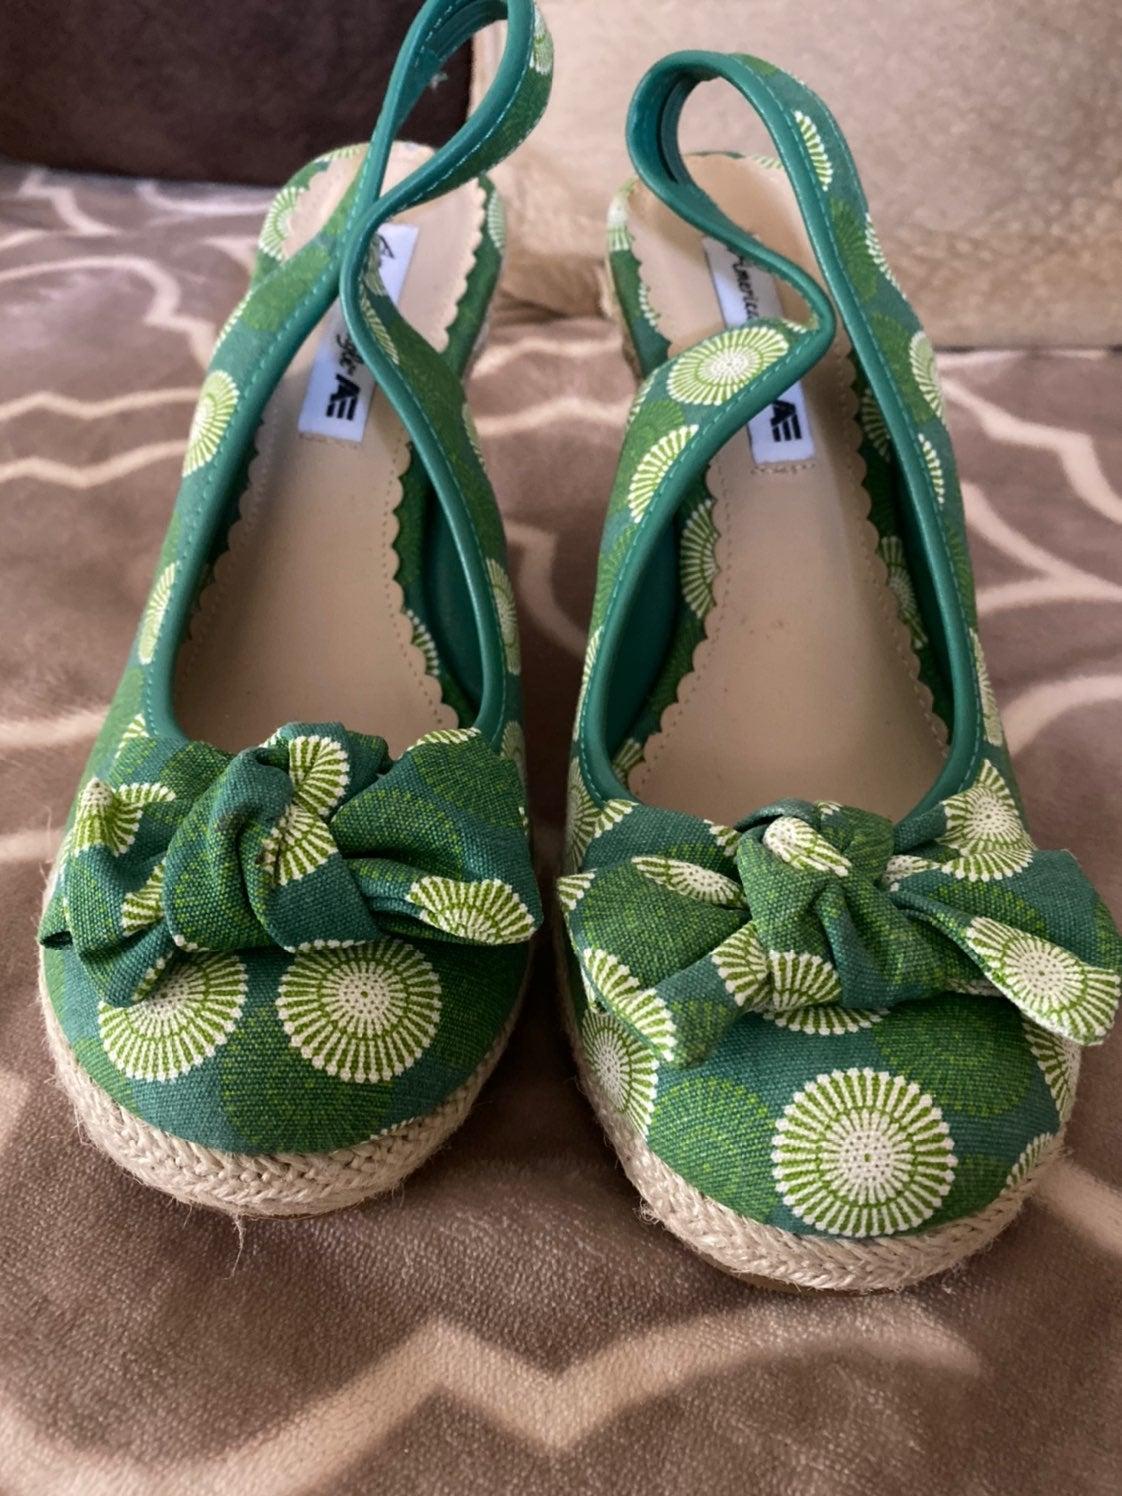 New American Eagle wedge heels sandals